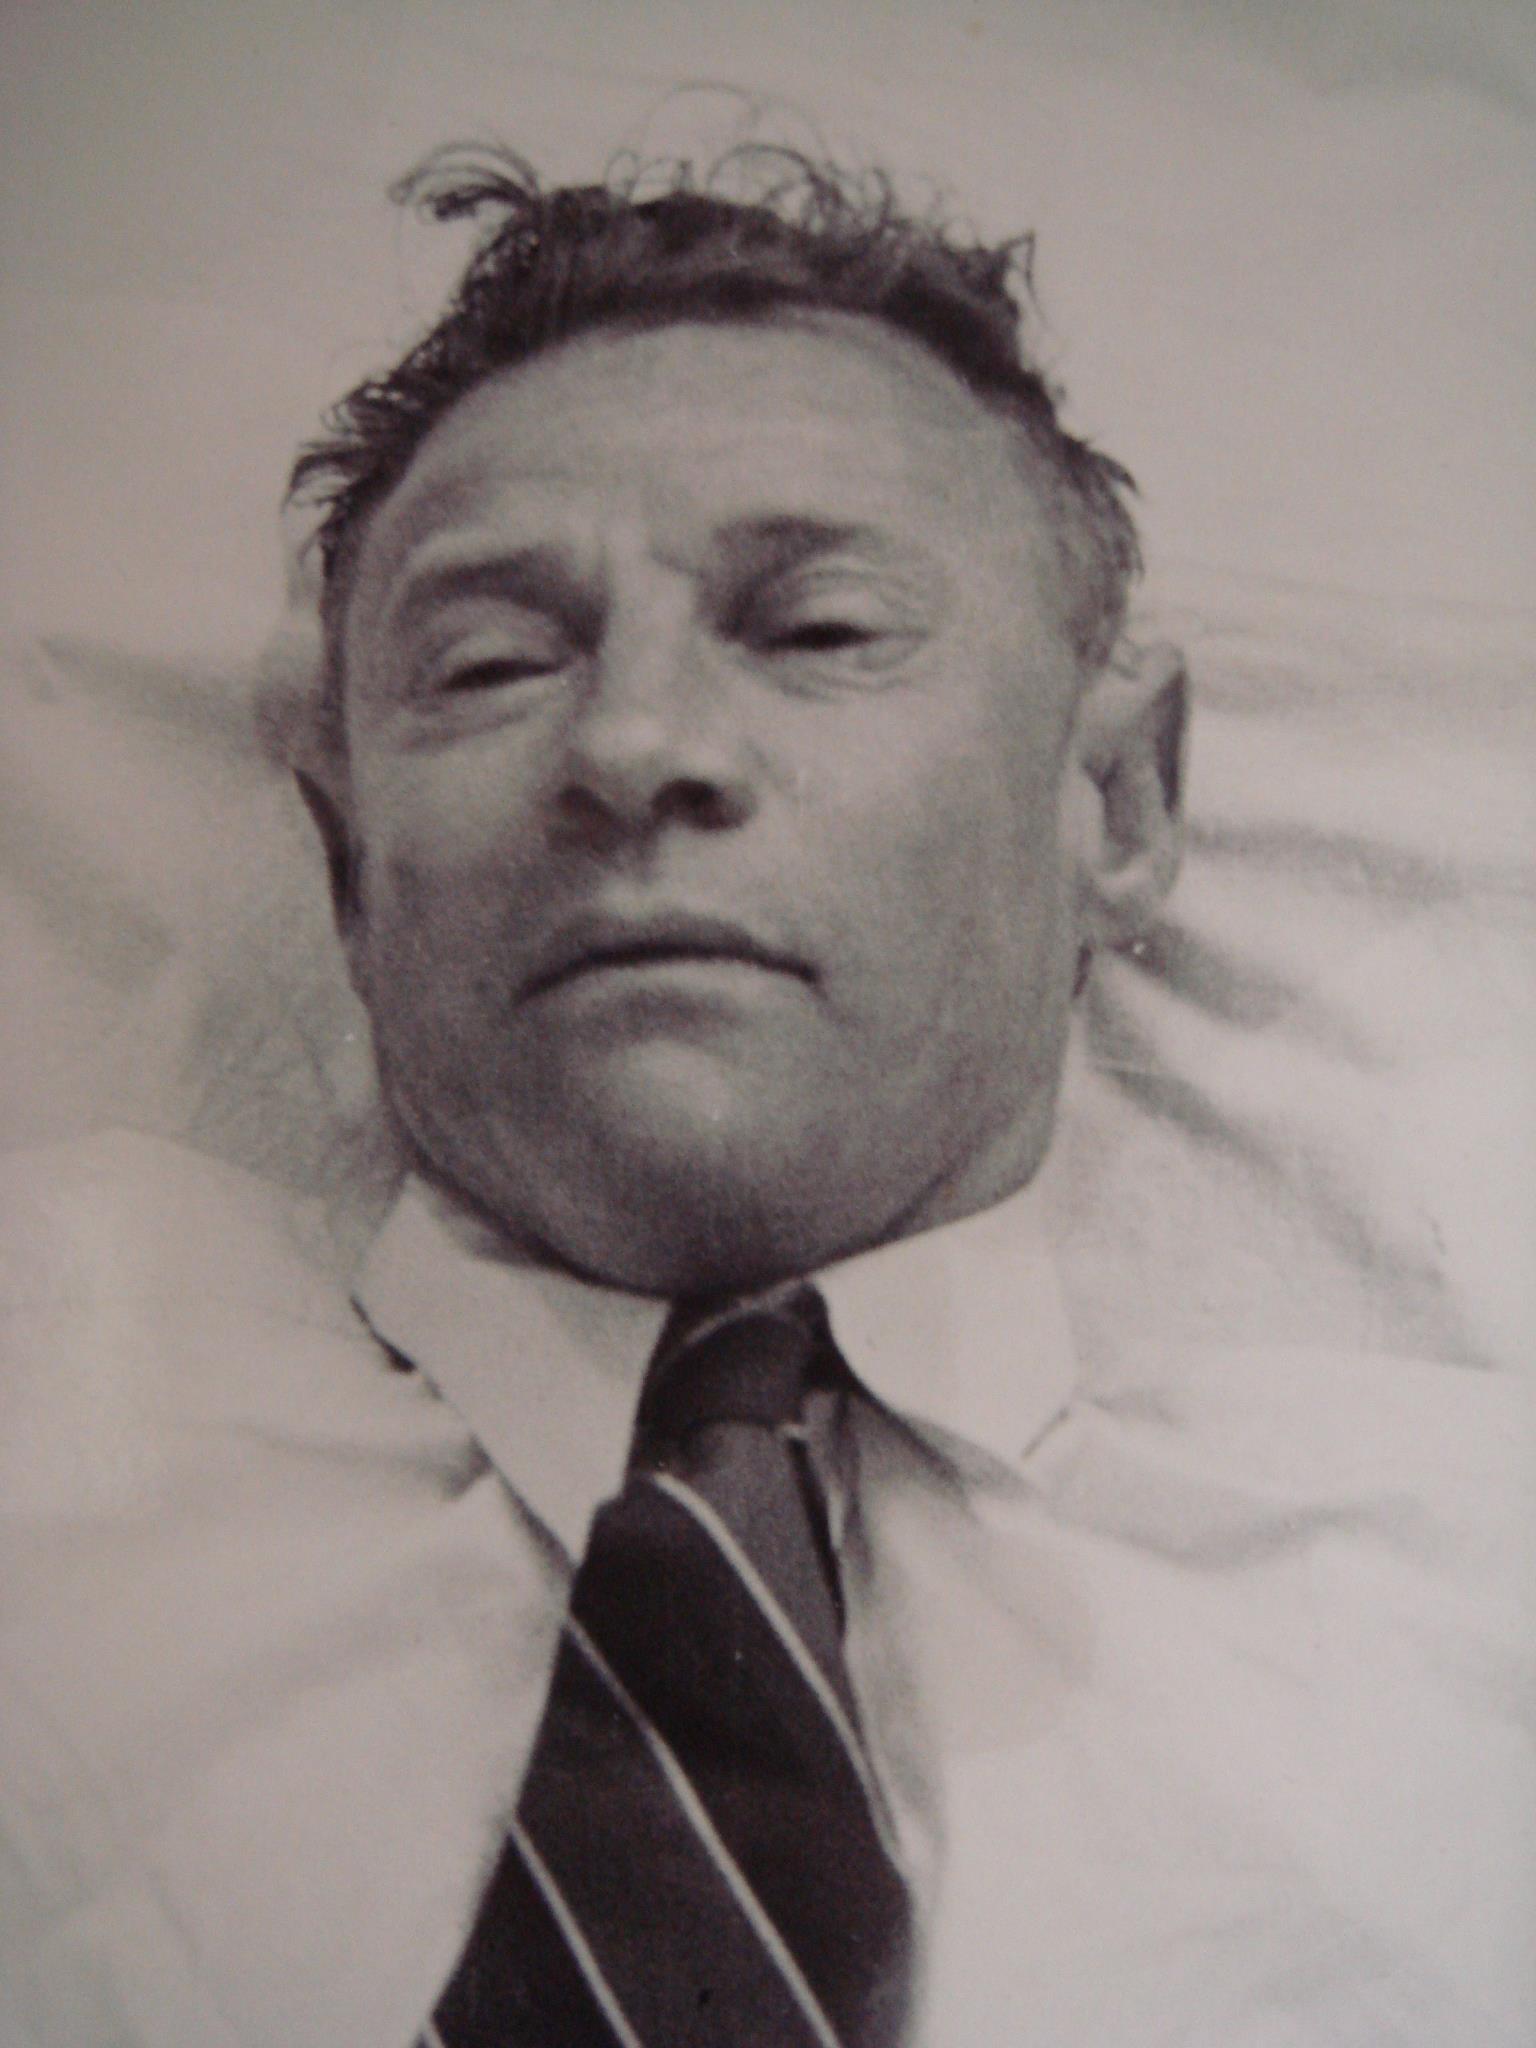 Richard Sorge - a man of amazing fate